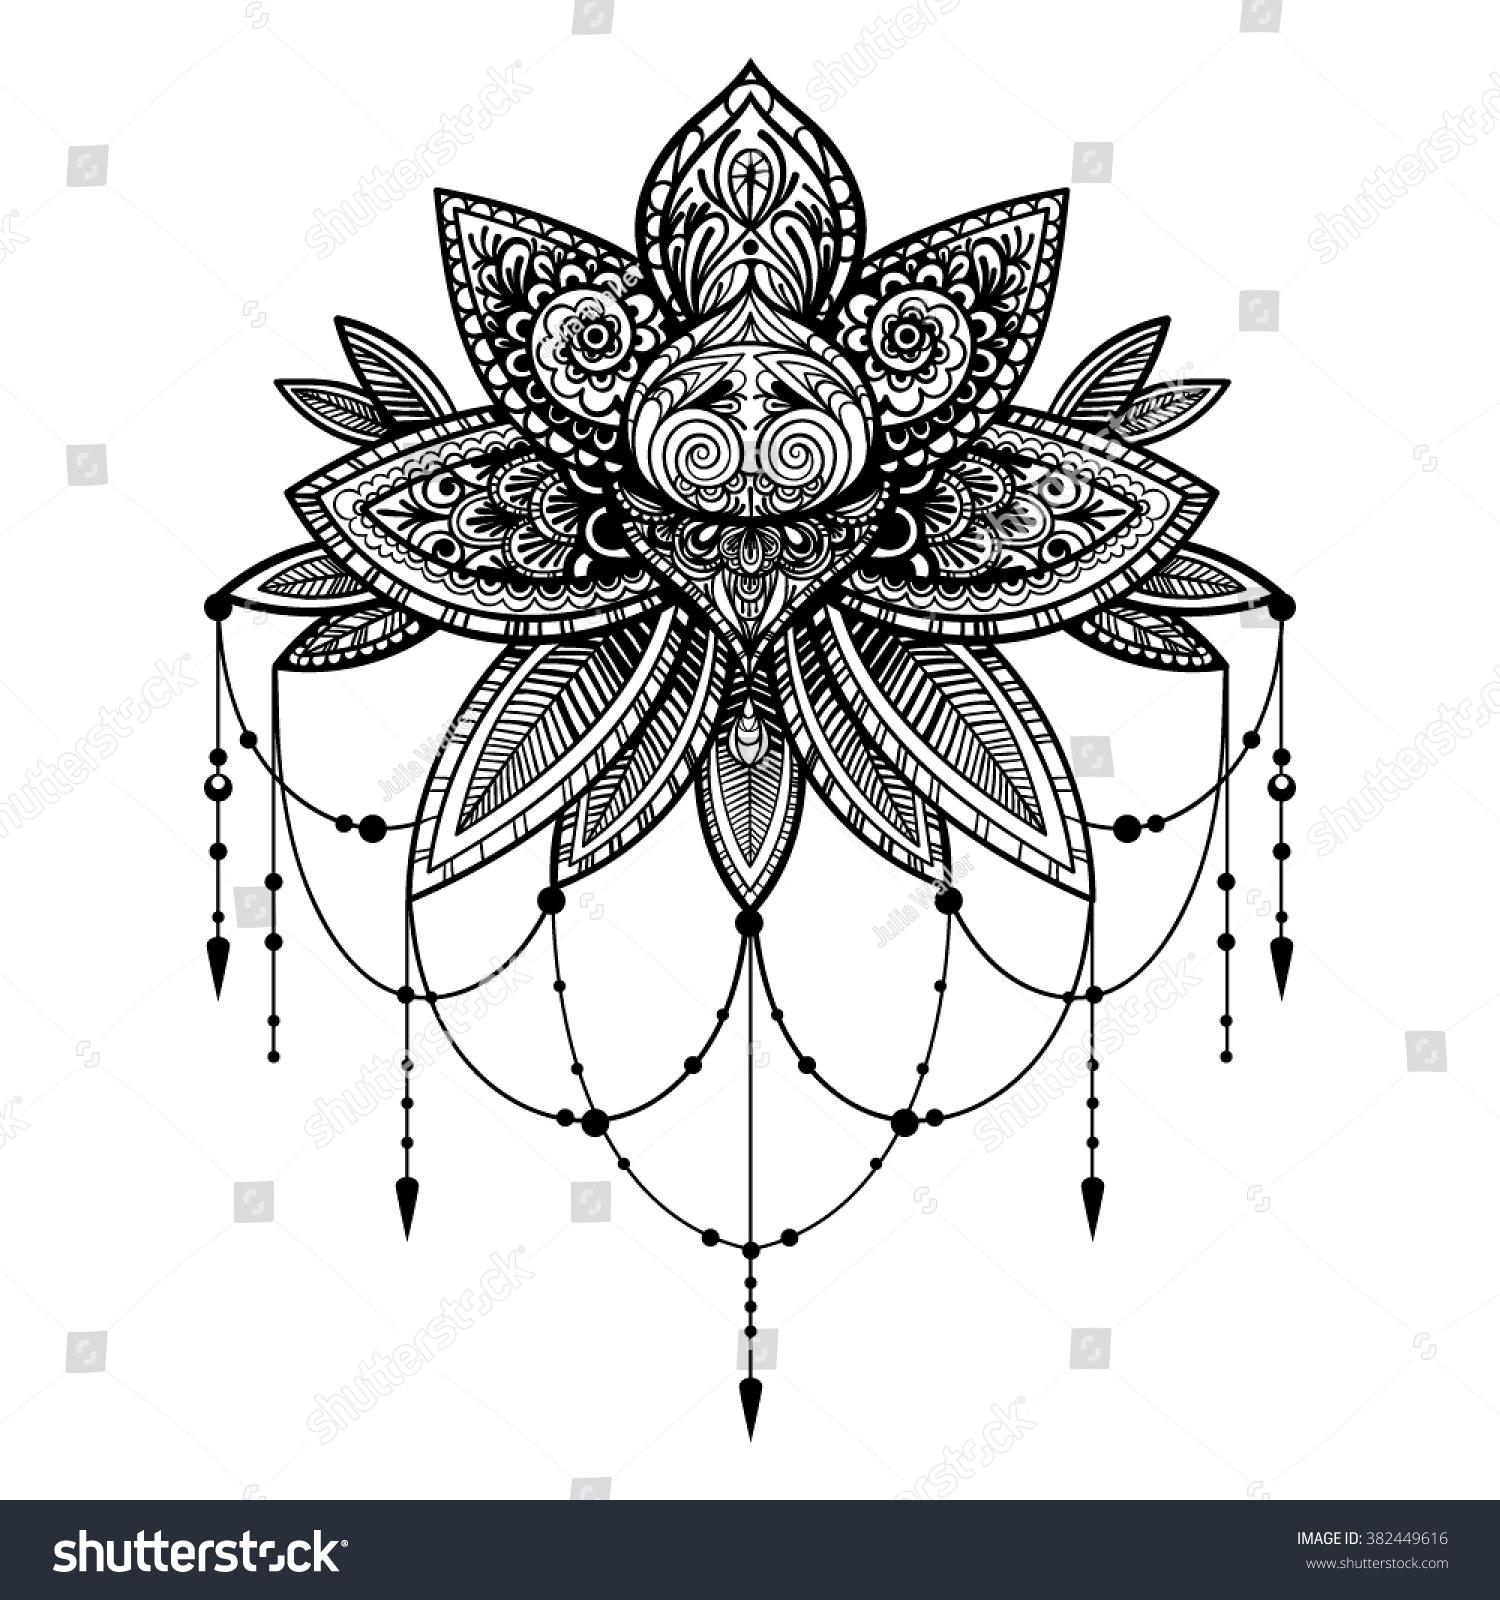 Vector Black White Tattoo Lotus Illustration Stock Vector Royalty